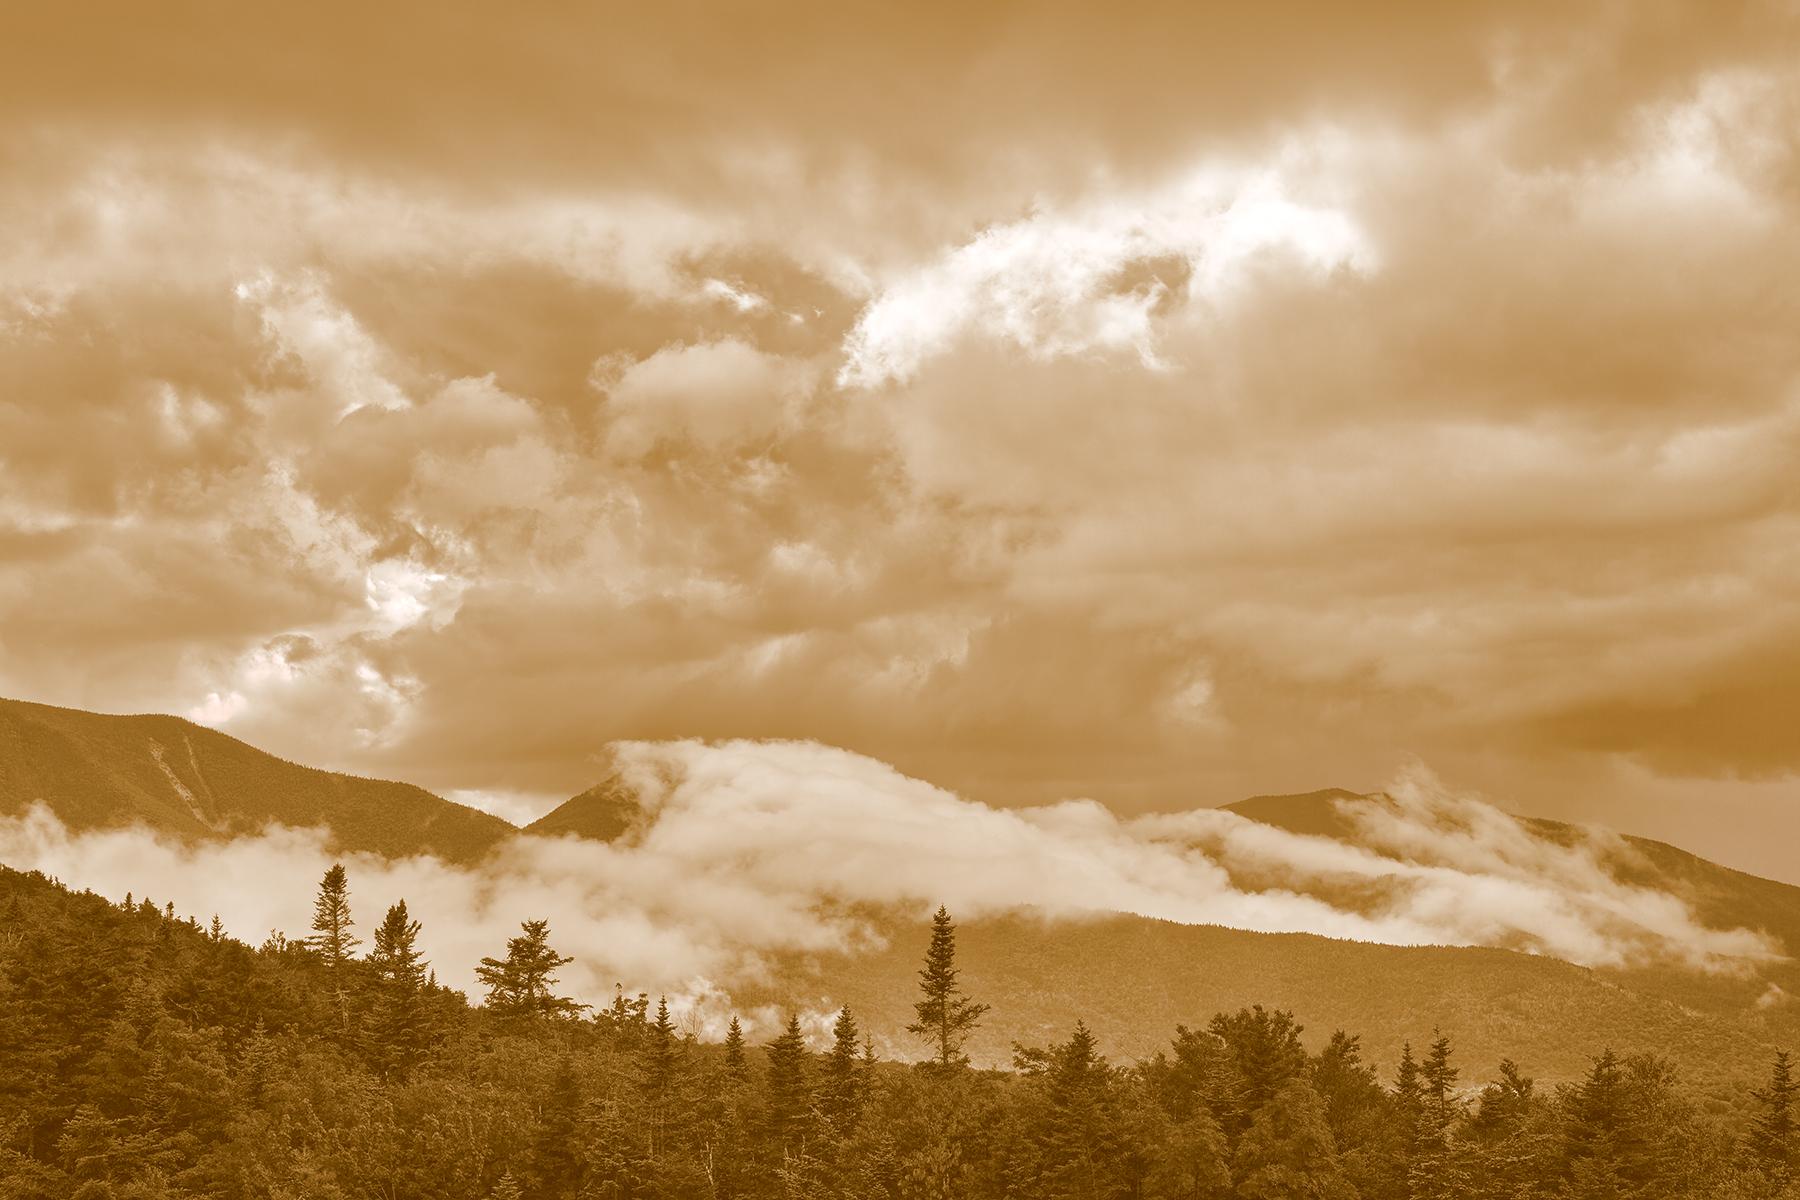 Glowing White Mountain Clouds - Sepia Cream Dream, America, Nh, Scene, Rays, HQ Photo